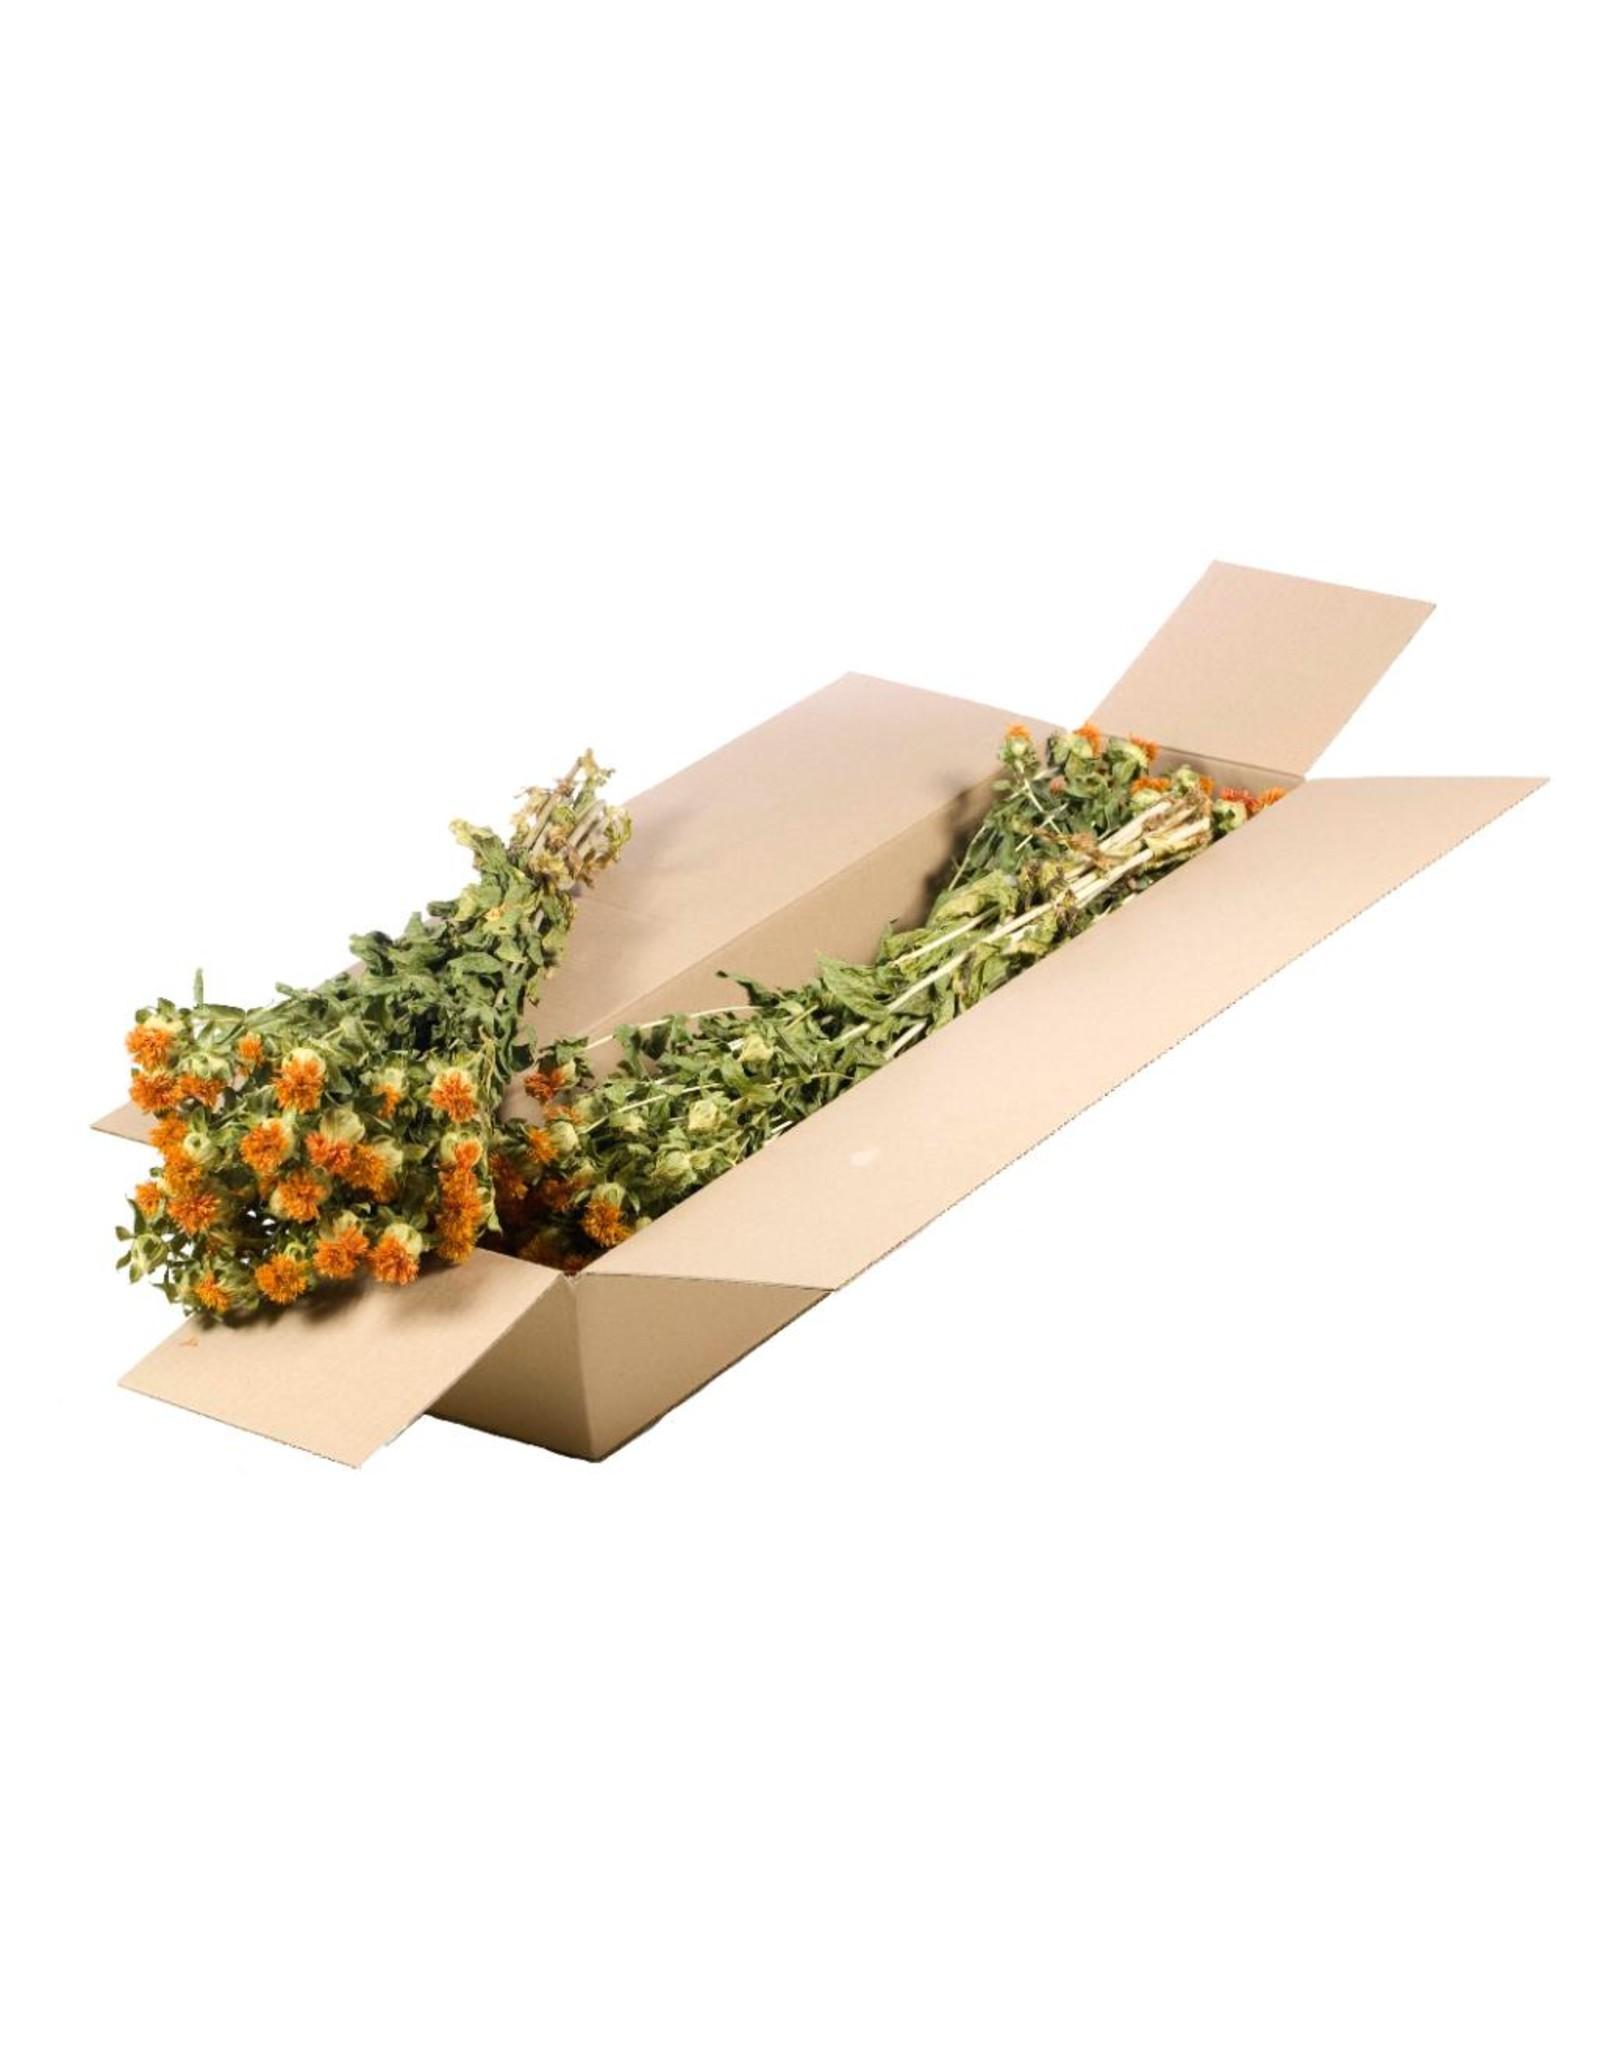 Bidens (carthamus) SB natural orange x 3